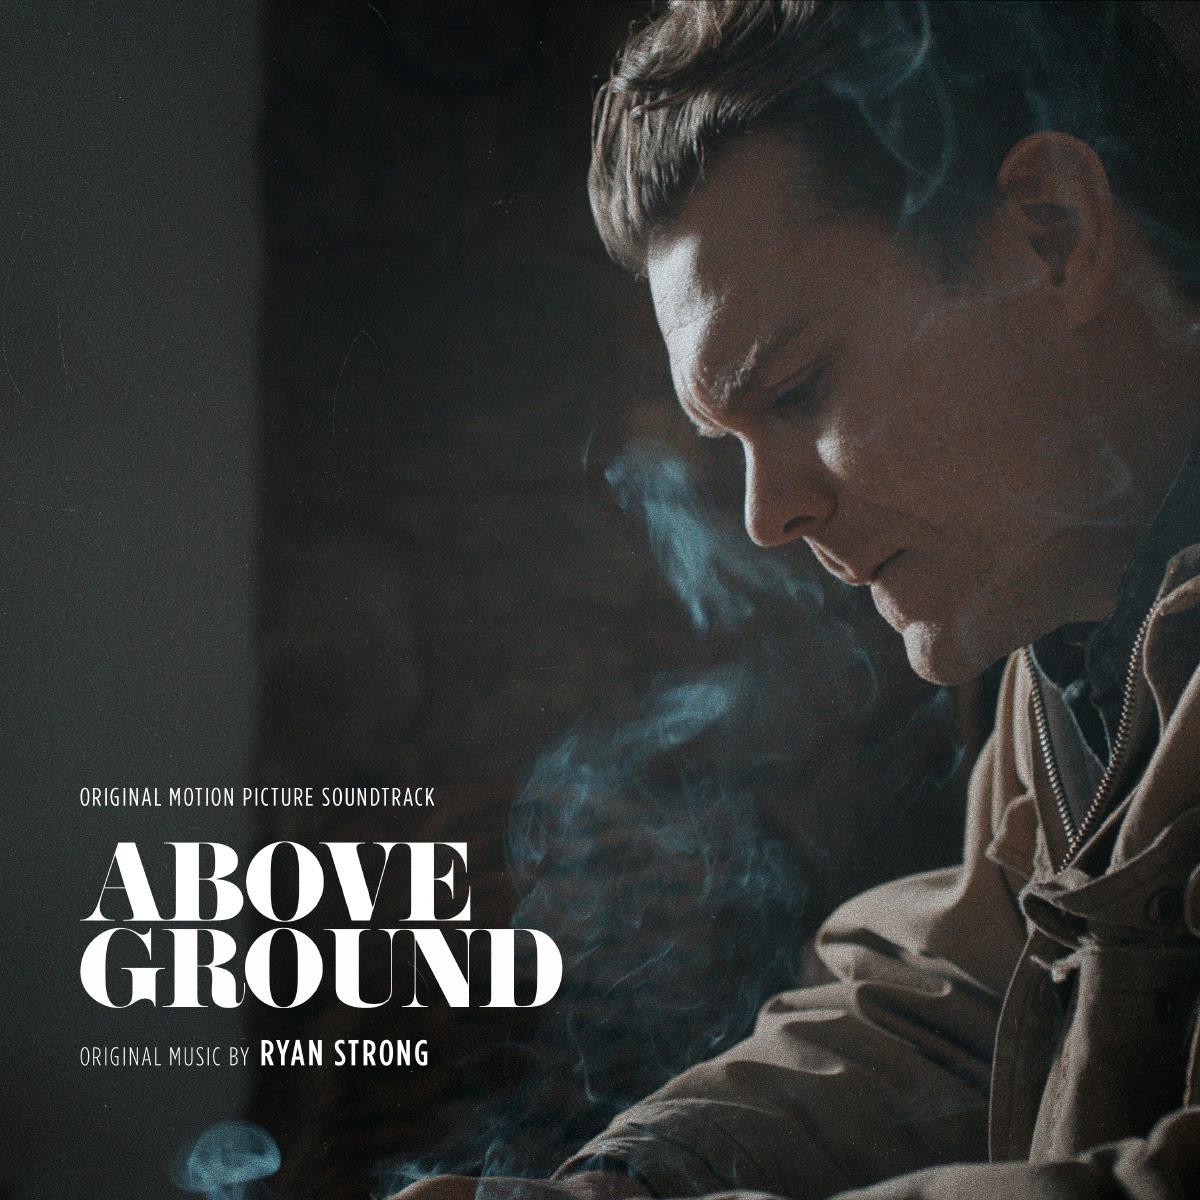 RyanStrong_AboveGround_Movie_Soundtrack.jpg